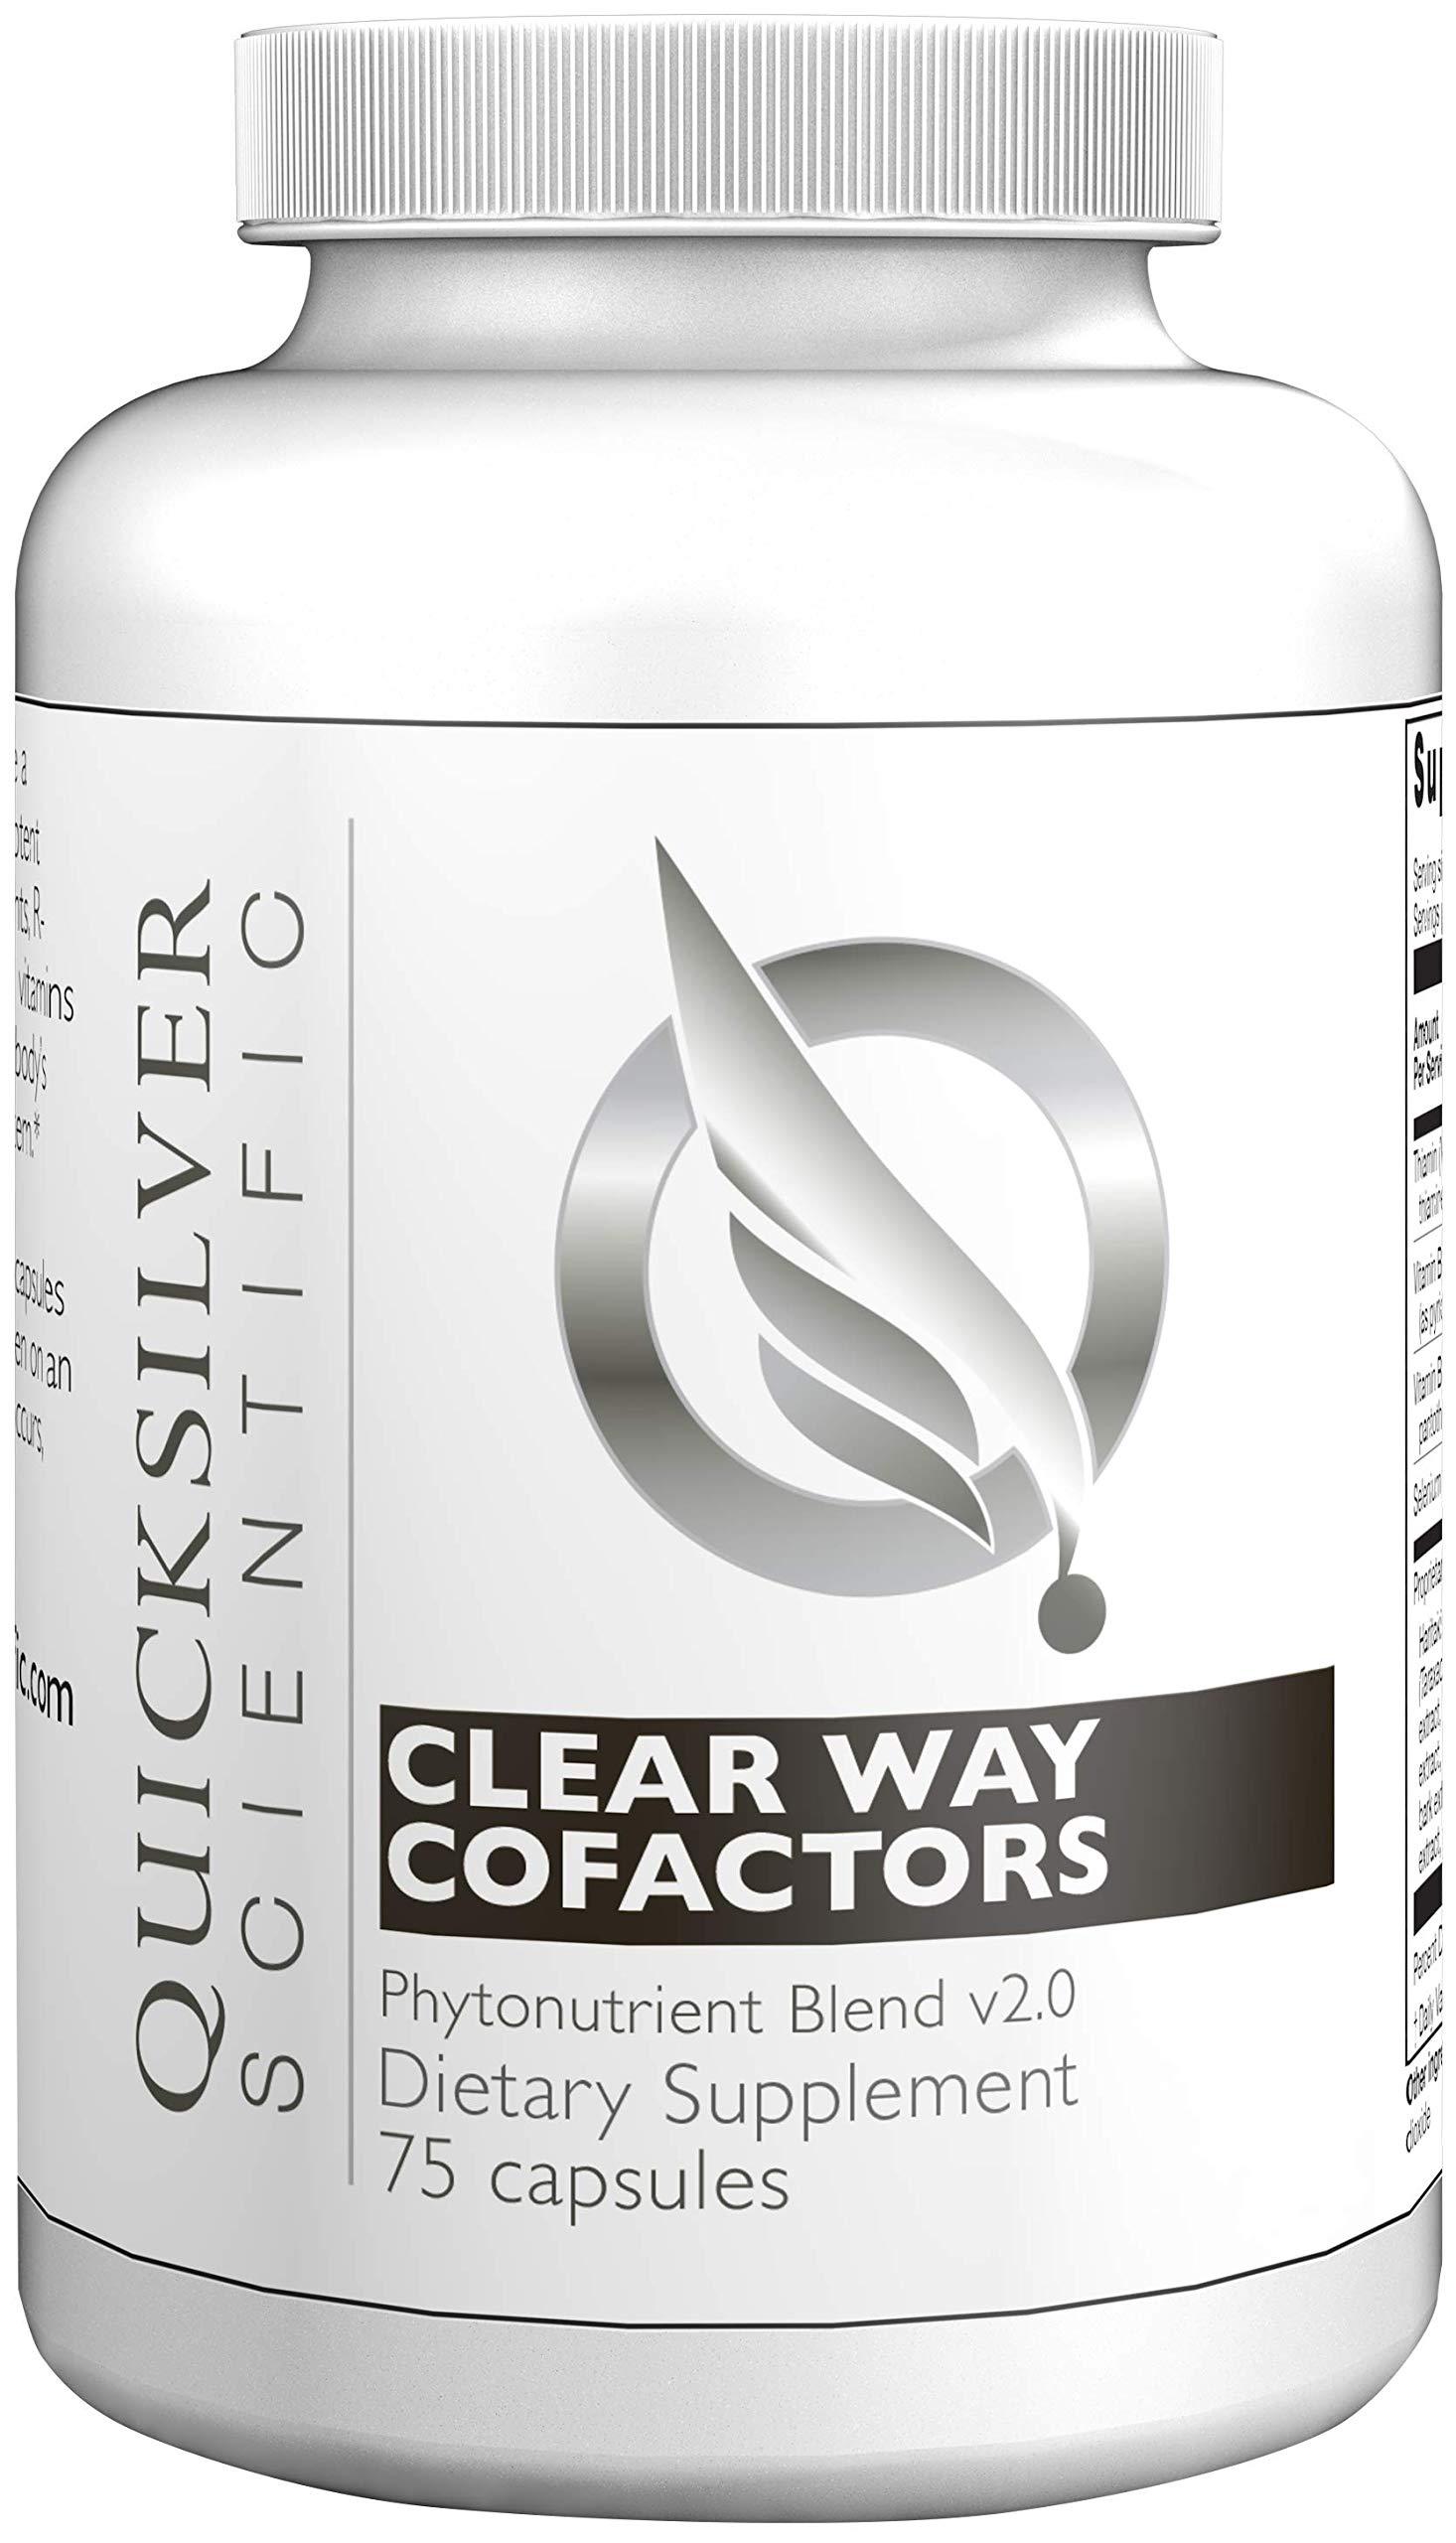 Quicksilver Scientific Clear Way Cofactors - Nattokinase, Milk Thistle + B Vitamins Phytonutrient Antioxidant Cleansing Support (75 Capsules) by Quicksilver Scientific